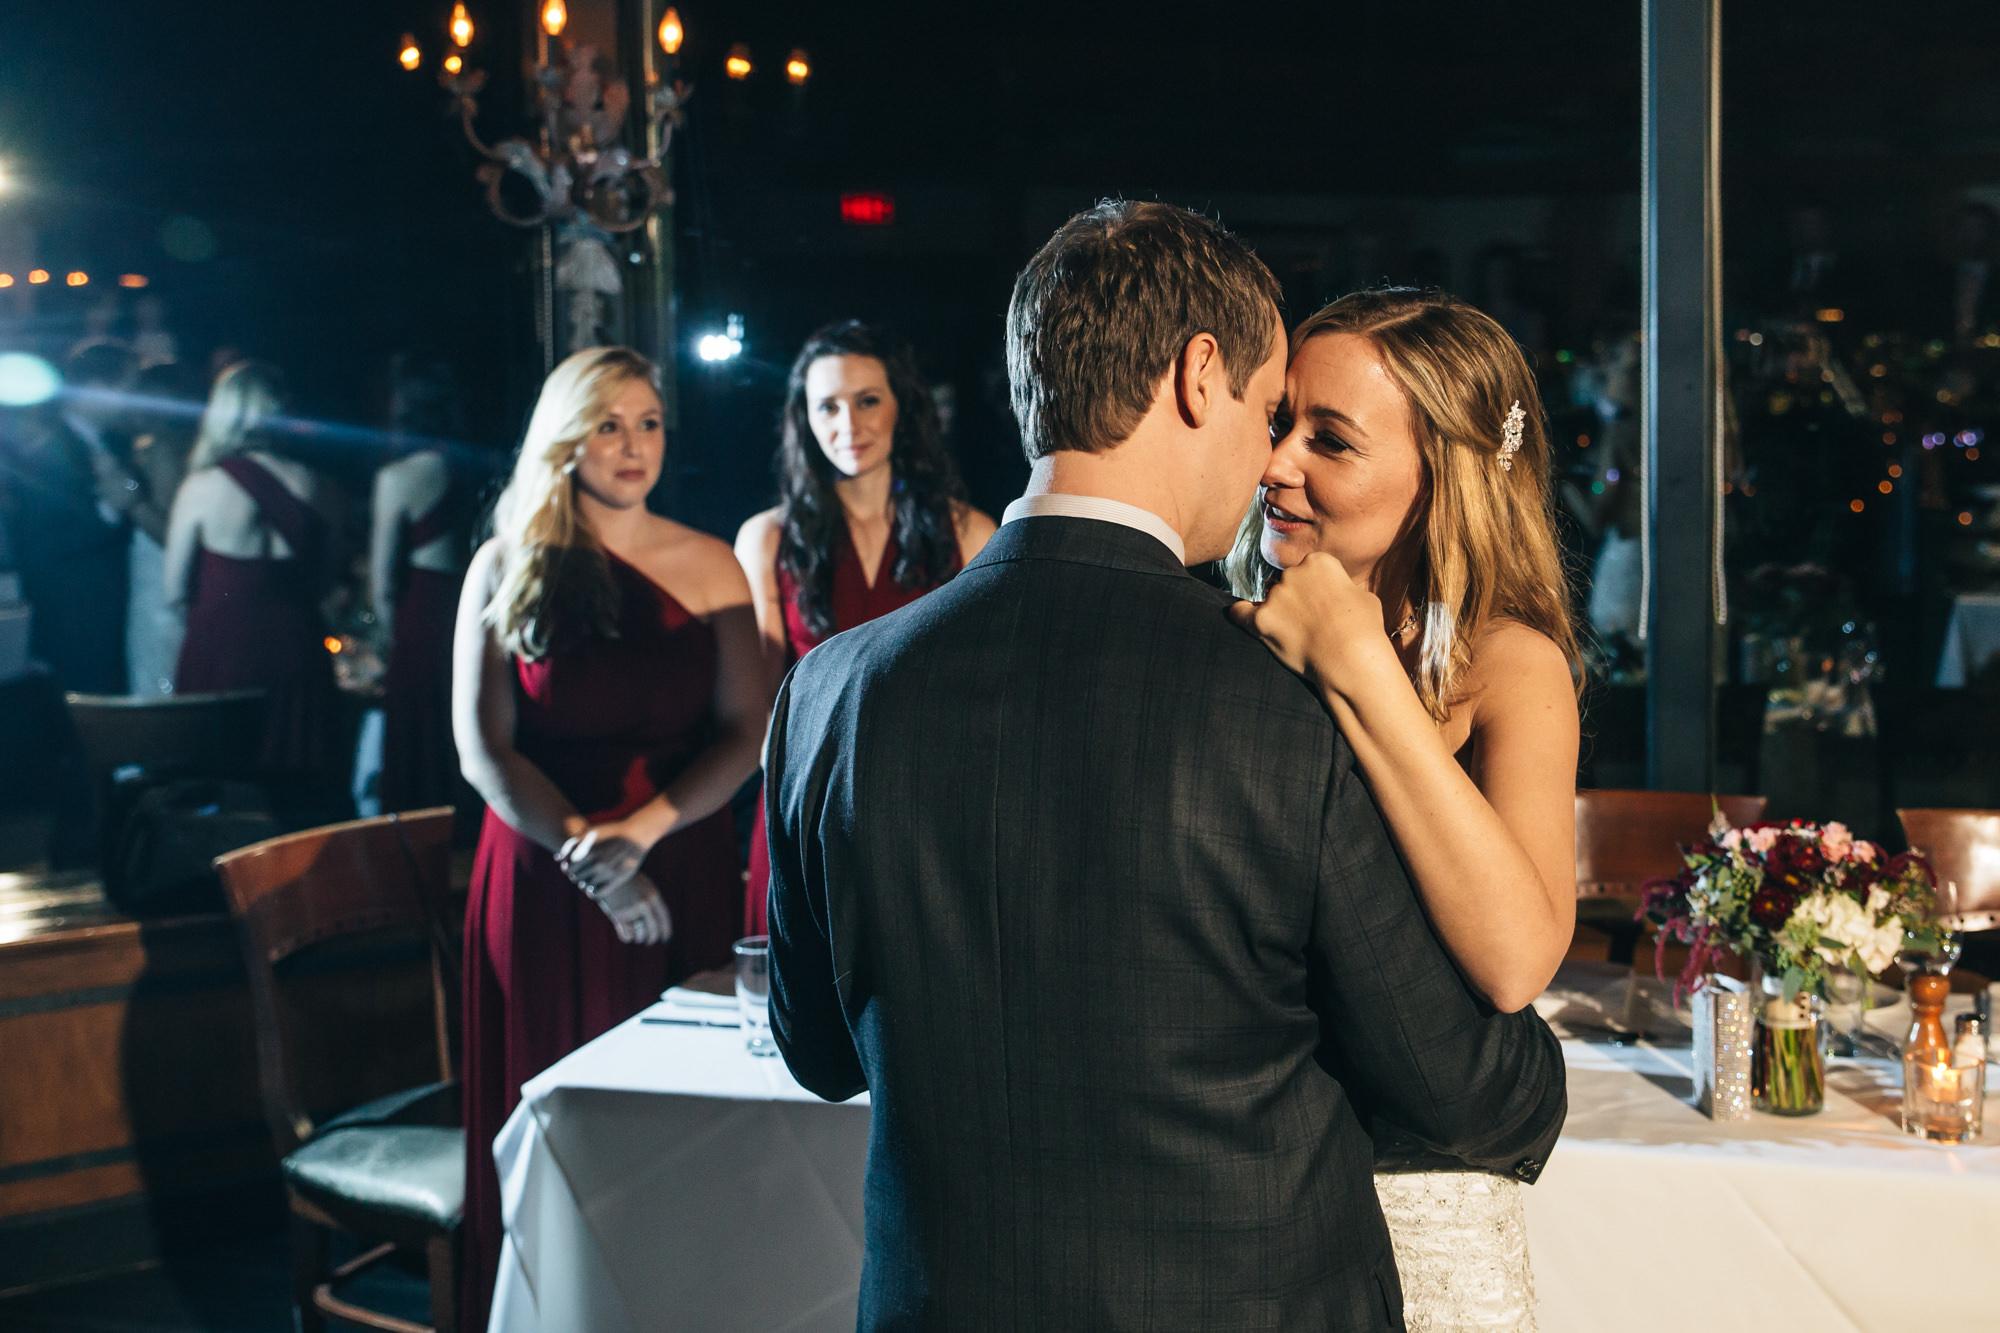 48-seasons-in-the-park-wedding-reception.jpg